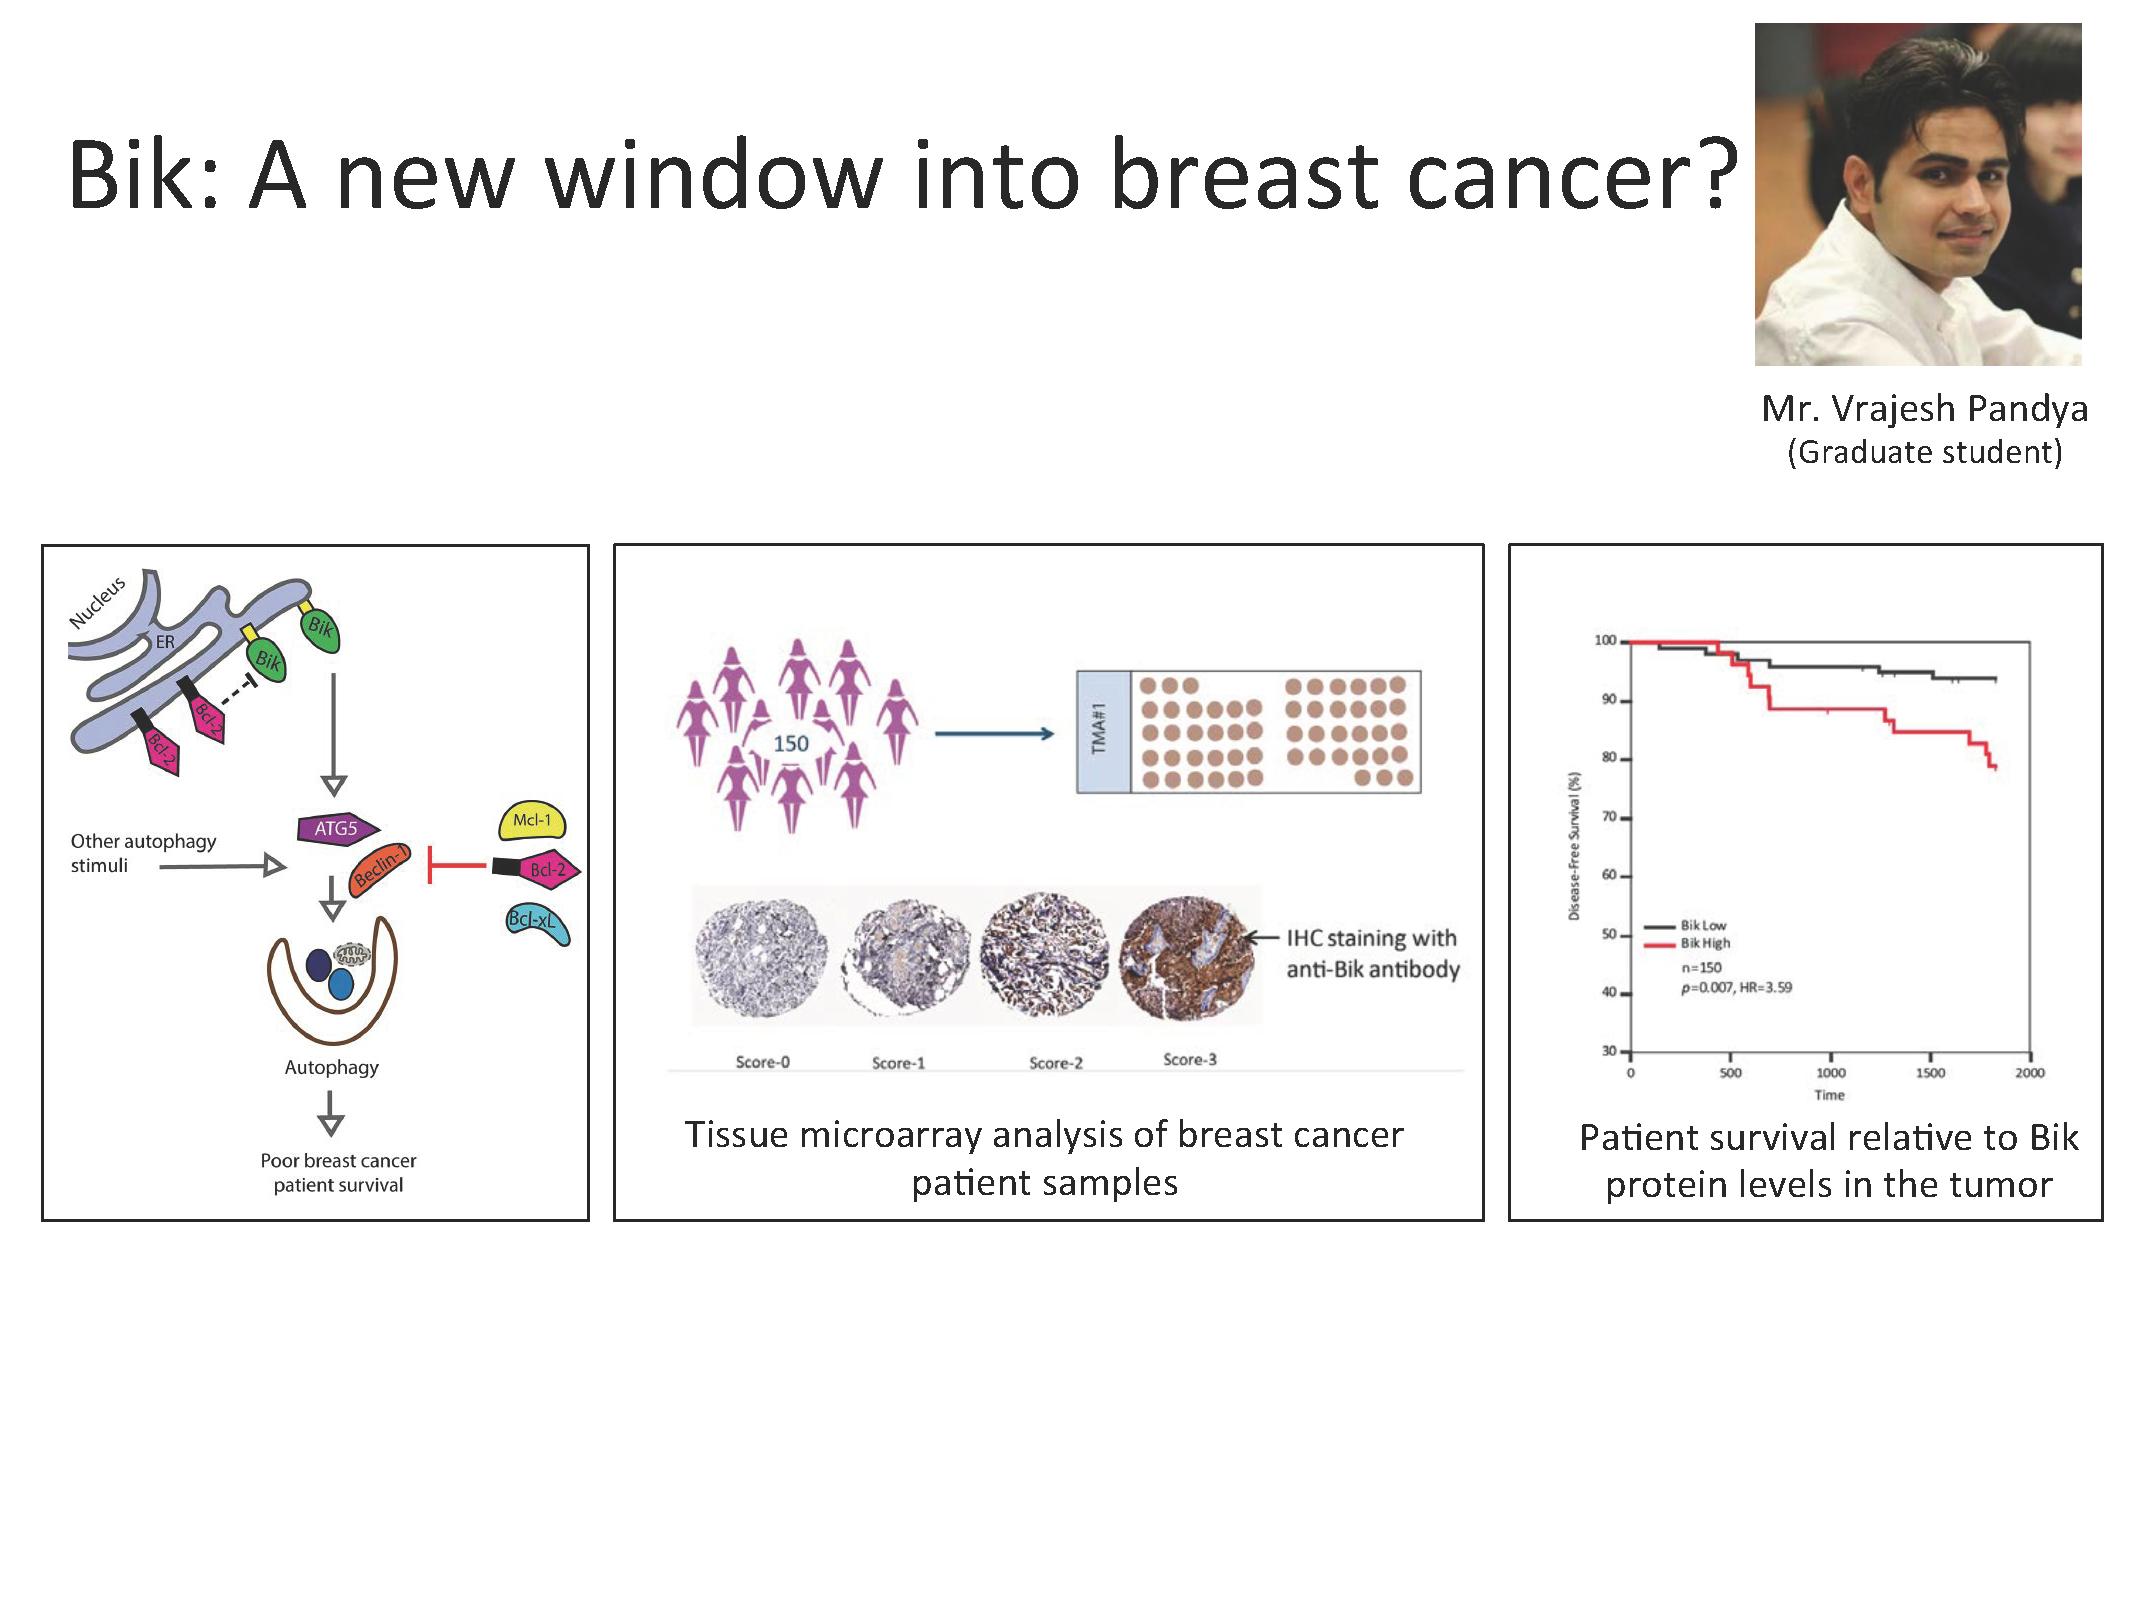 Bik: A new window into breast cancer?